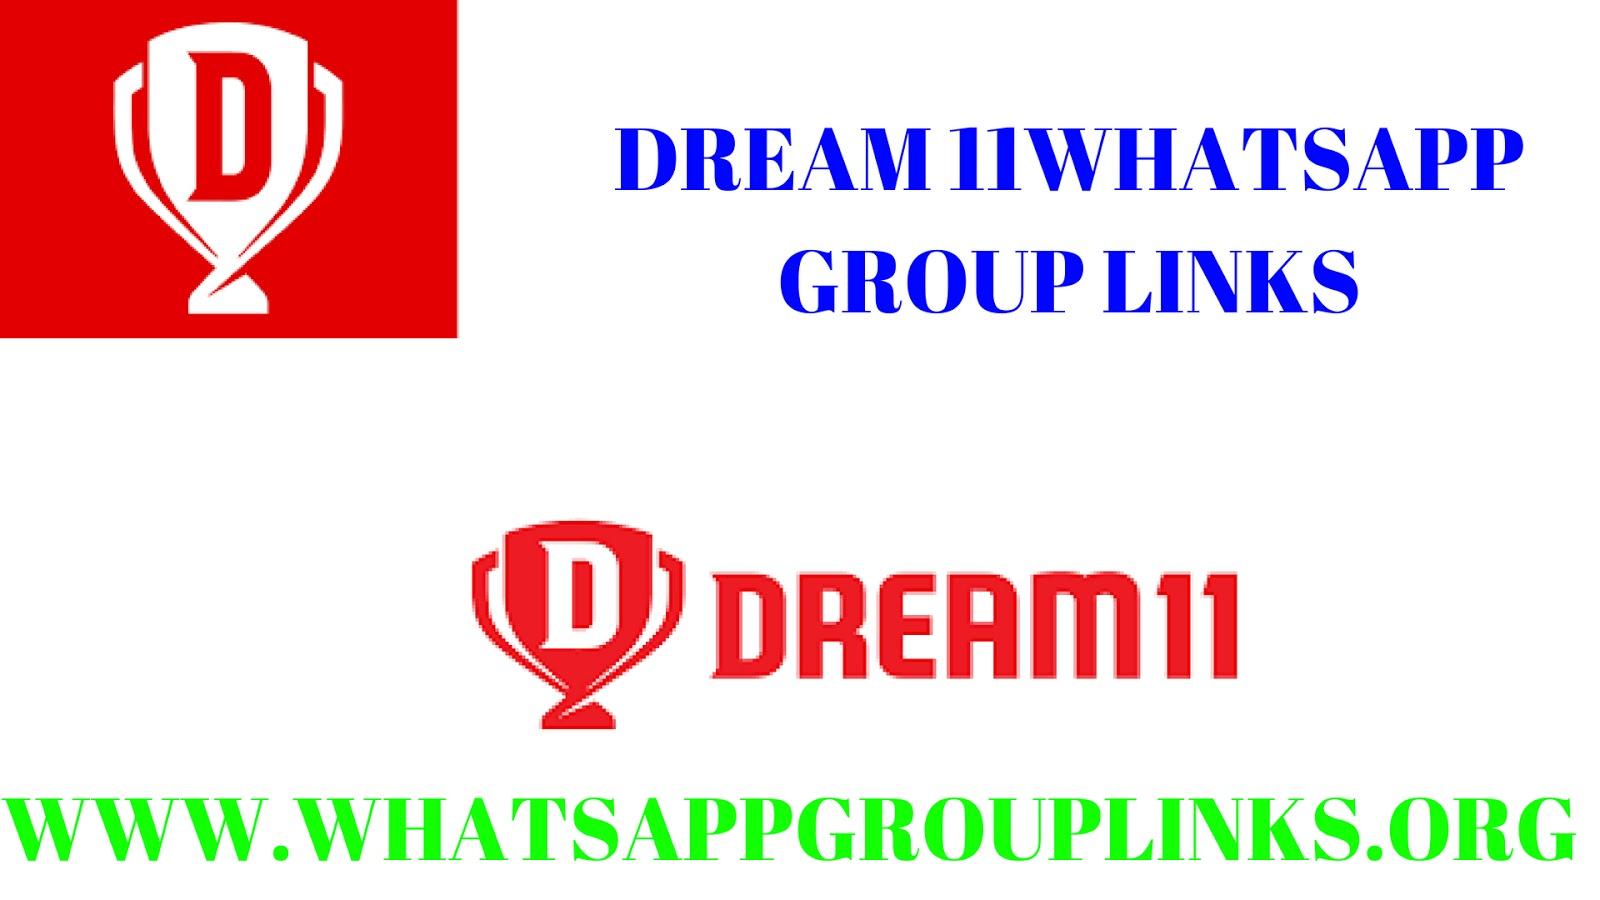 JOIN DREAM 11 WHATSAPP GROUP LINKS-WHATSAPP GROUP LINK - Whatsapp